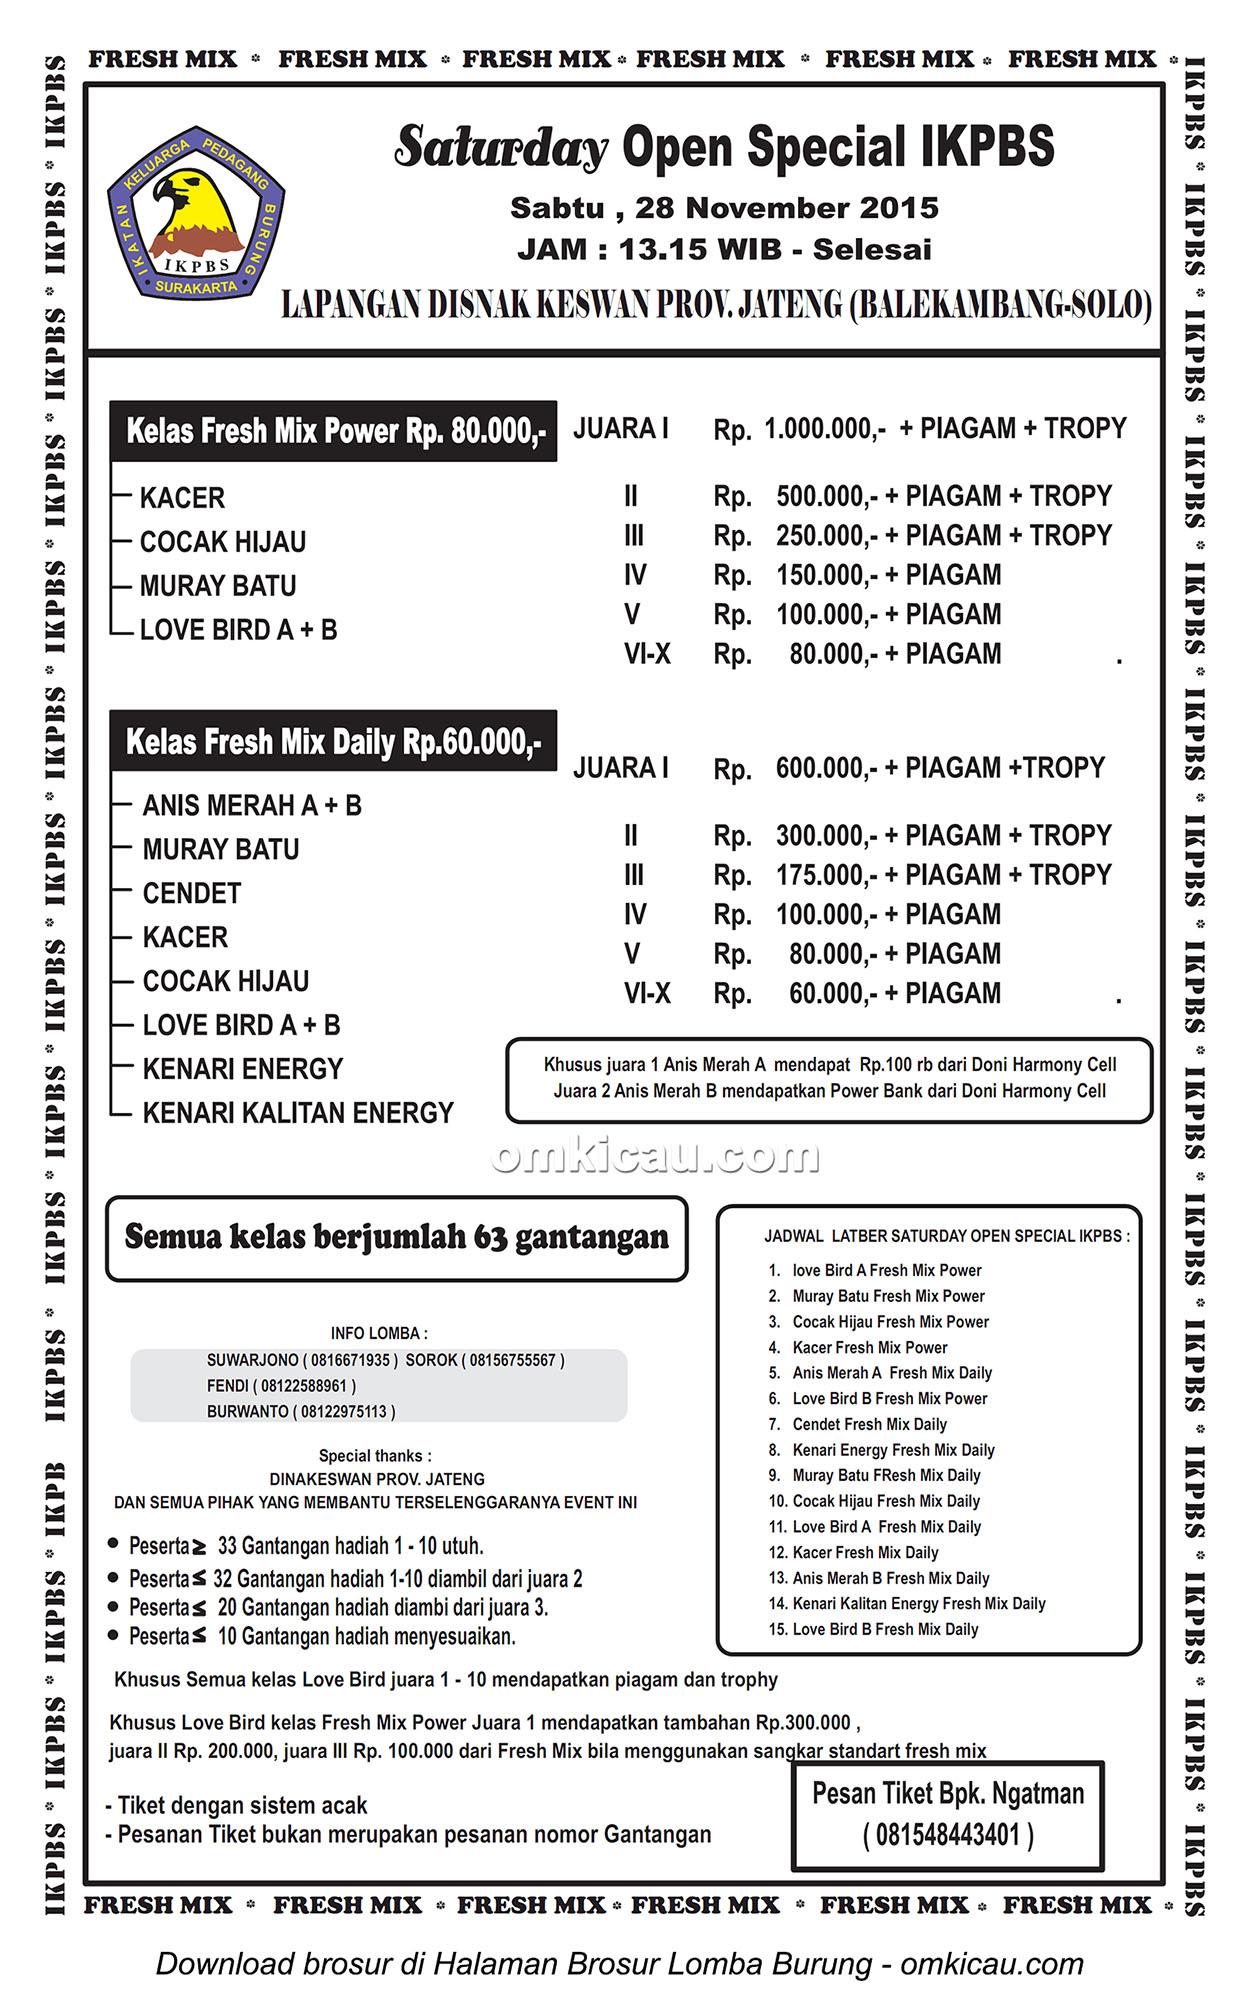 Brosur Lomba Burung Berkicau Saturday Open Special IKPBS, Solo, 28 November 2015